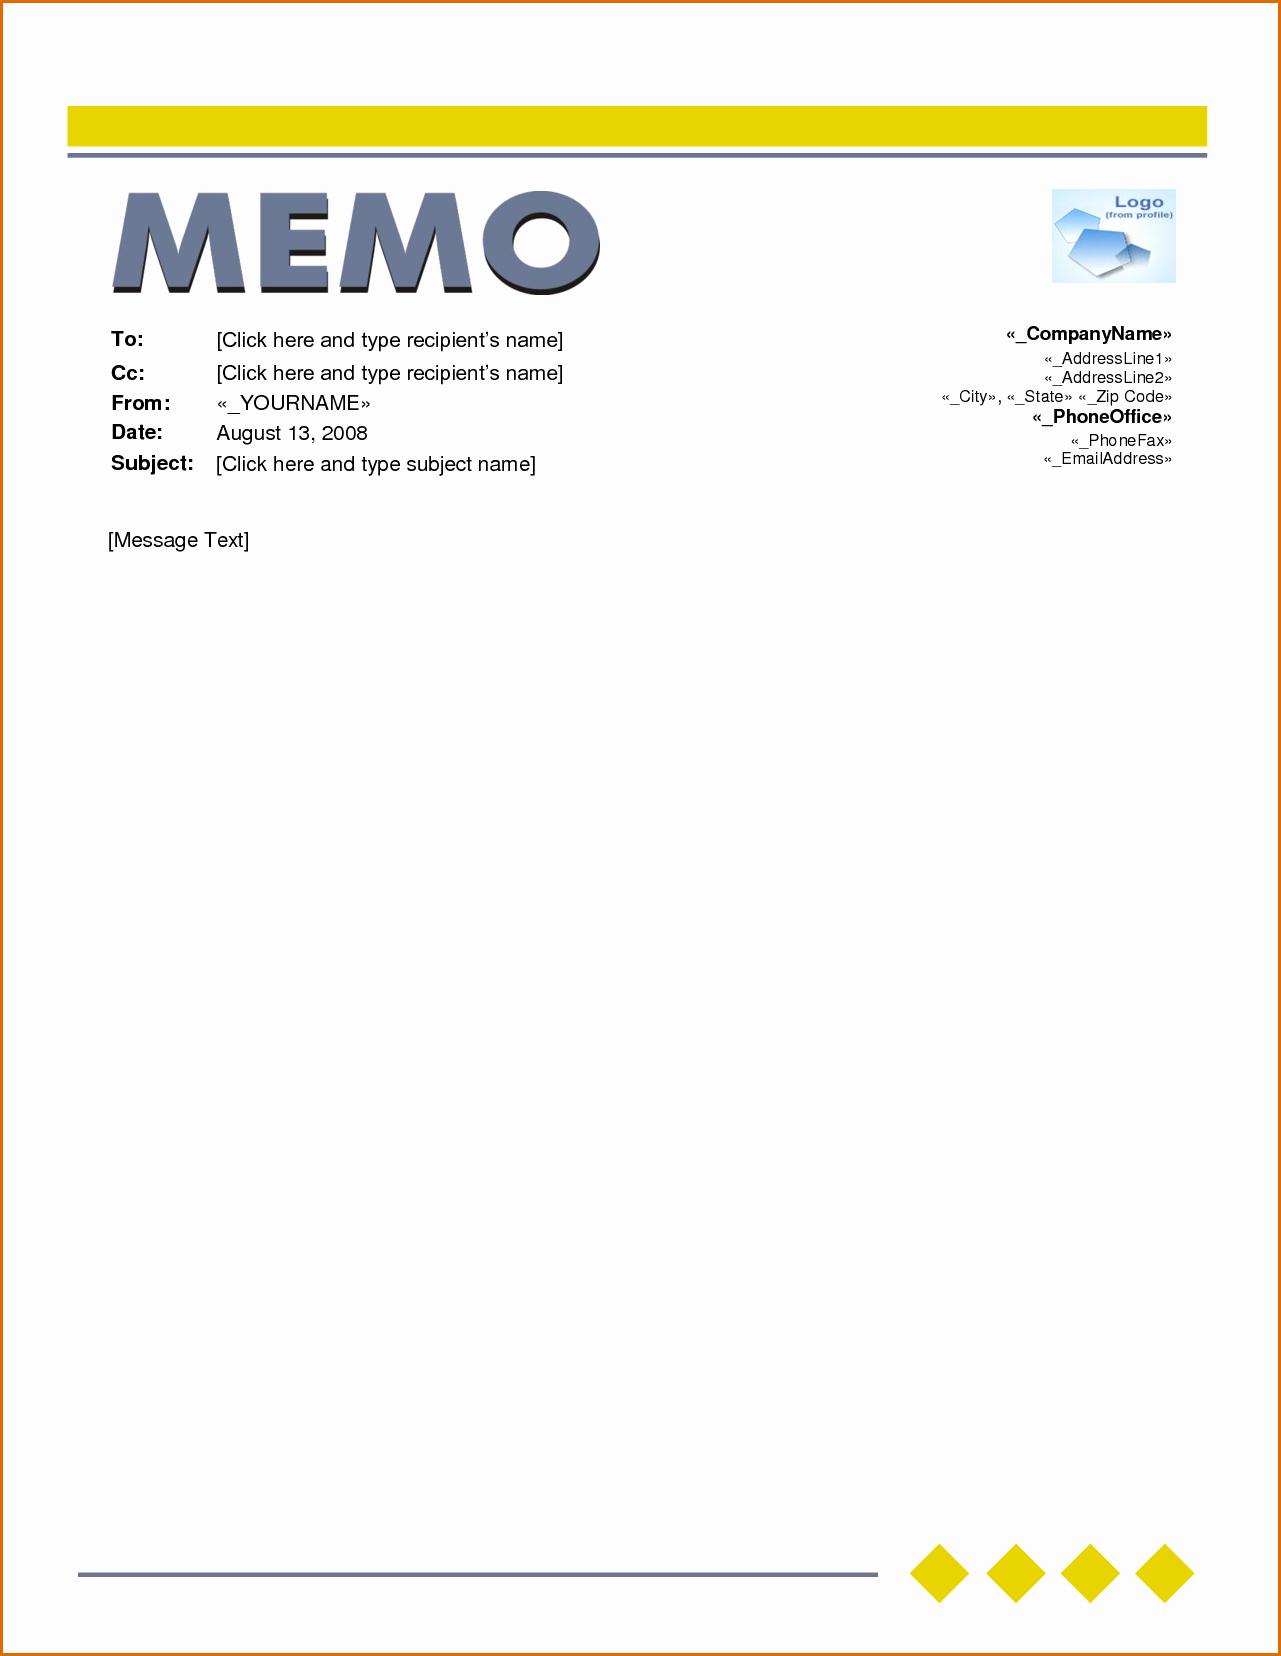 Microsoft Word Memo Templates Awesome 7 Free Memo Template